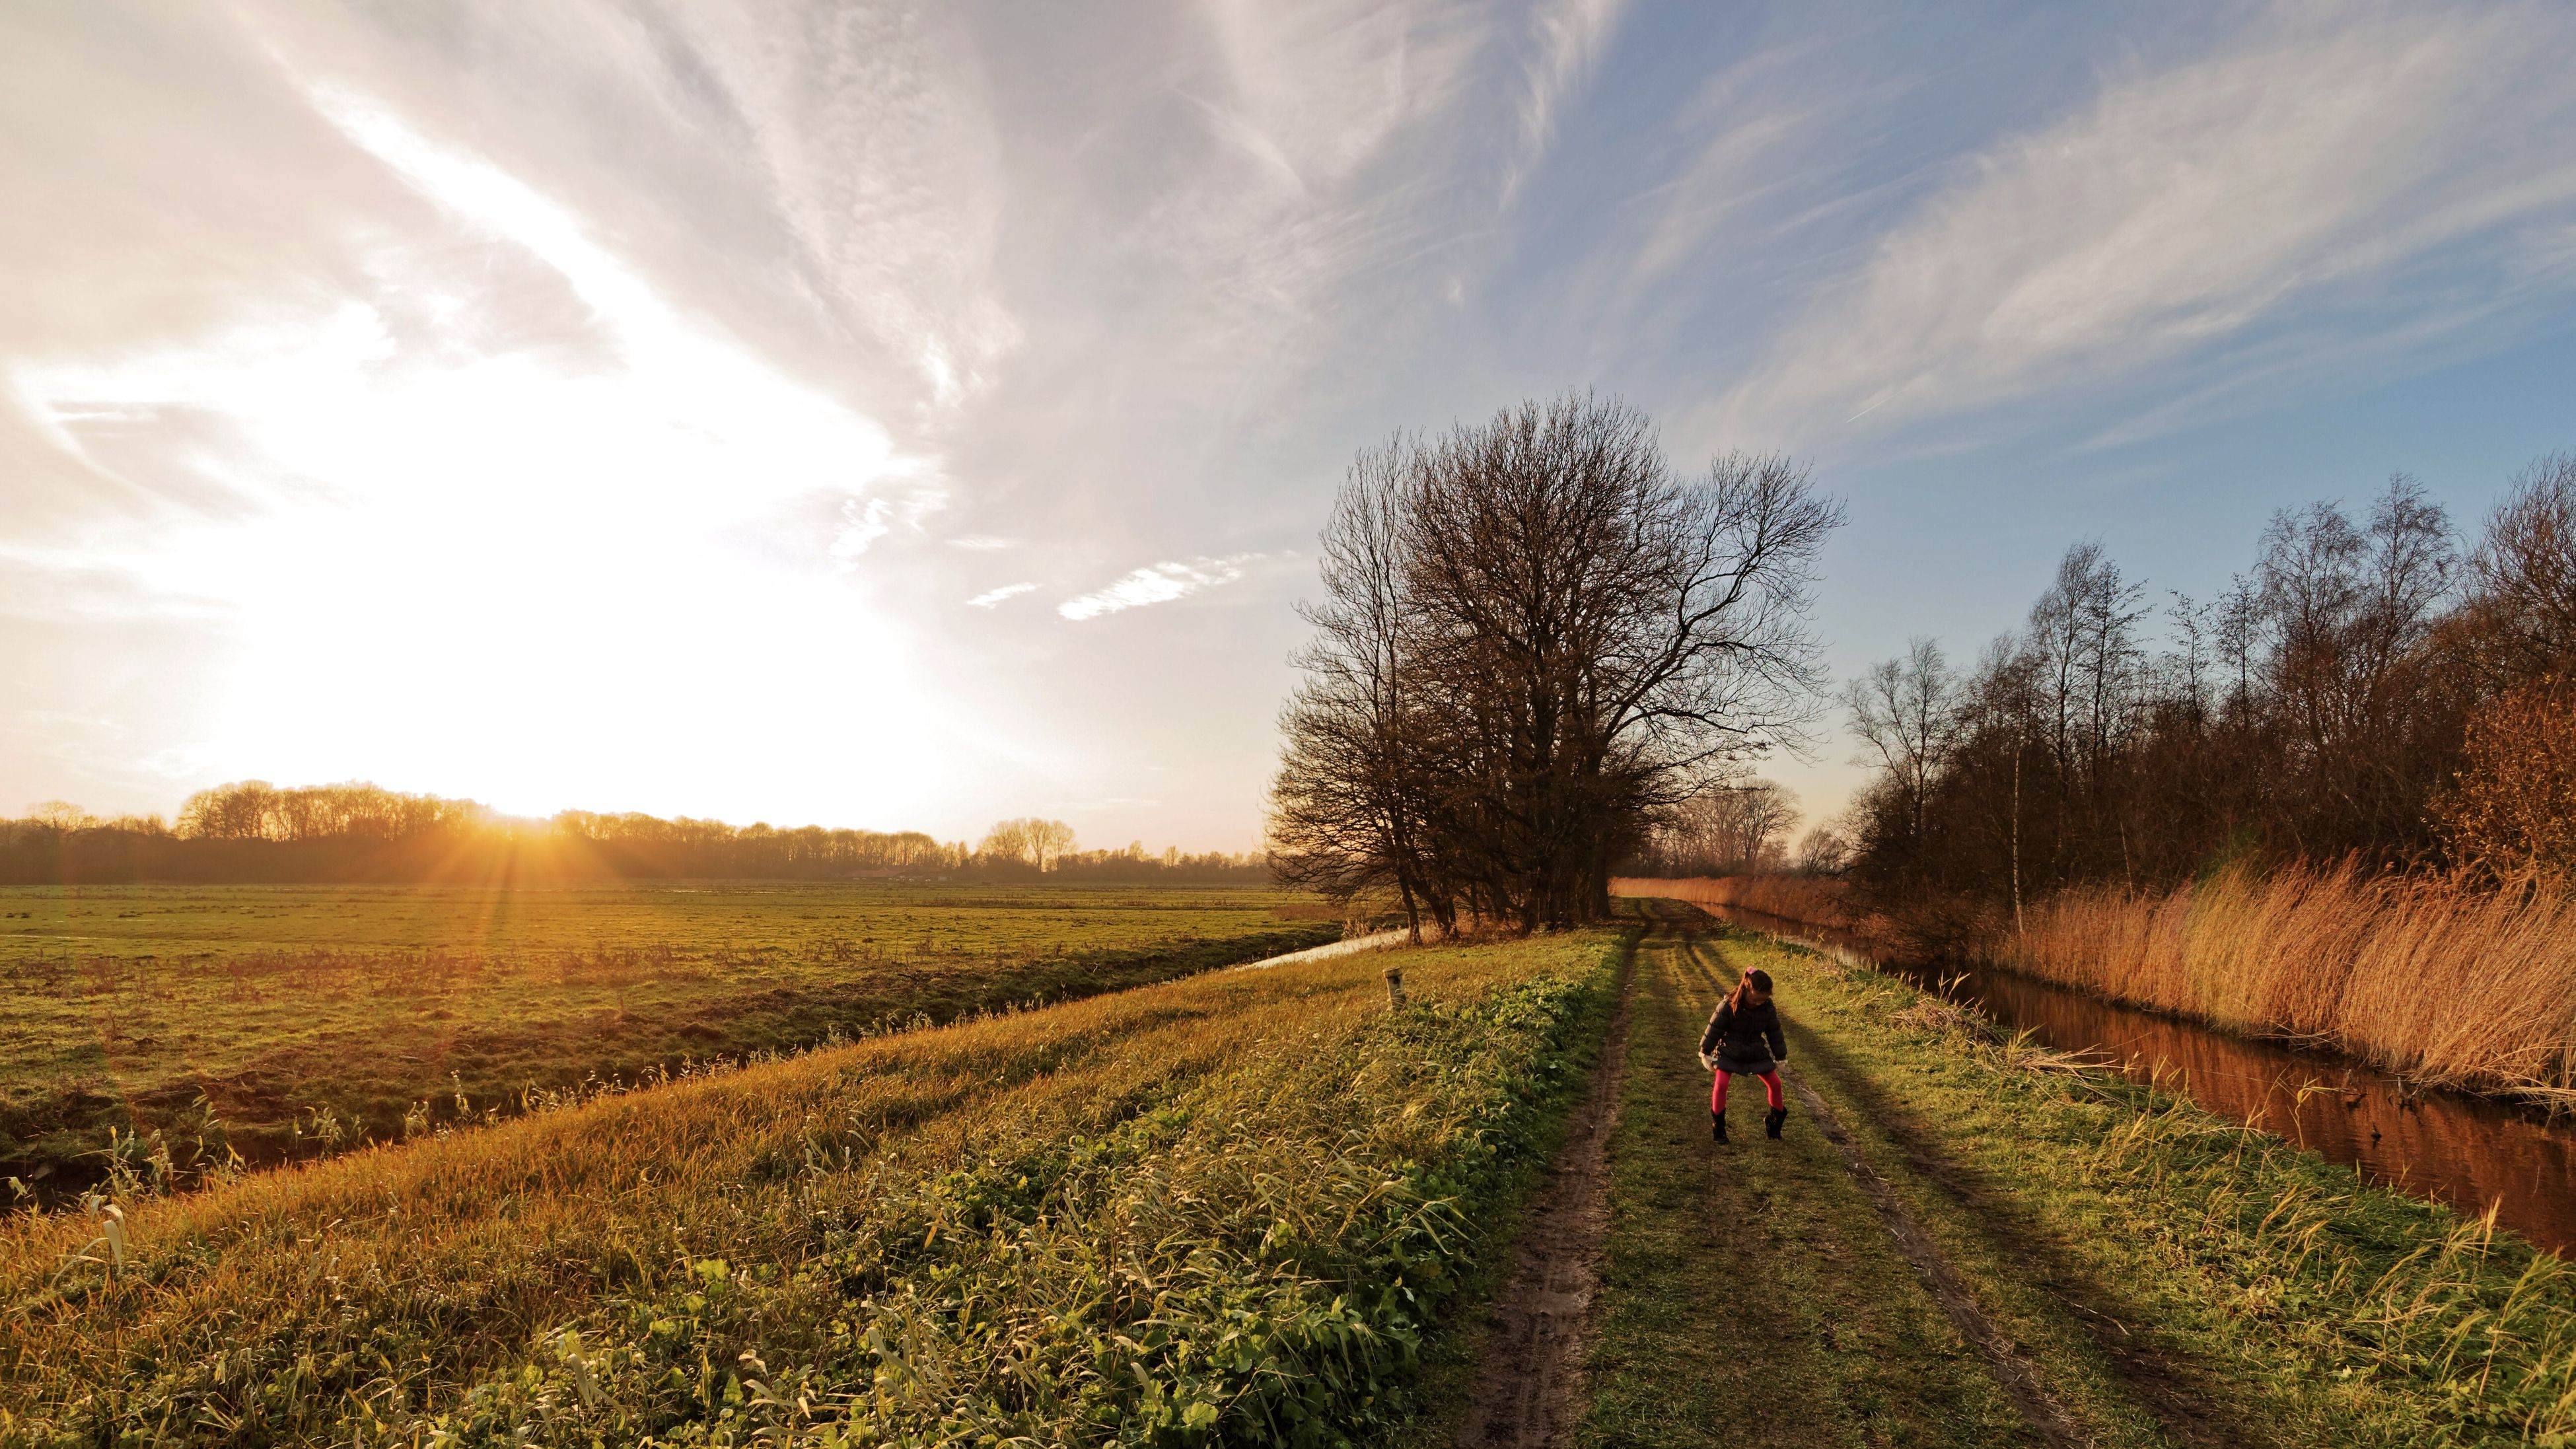 field, grass, lifestyles, leisure activity, sun, men, sky, tree, landscape, sunlight, walking, domestic animals, sunbeam, rural scene, person, nature, tranquility